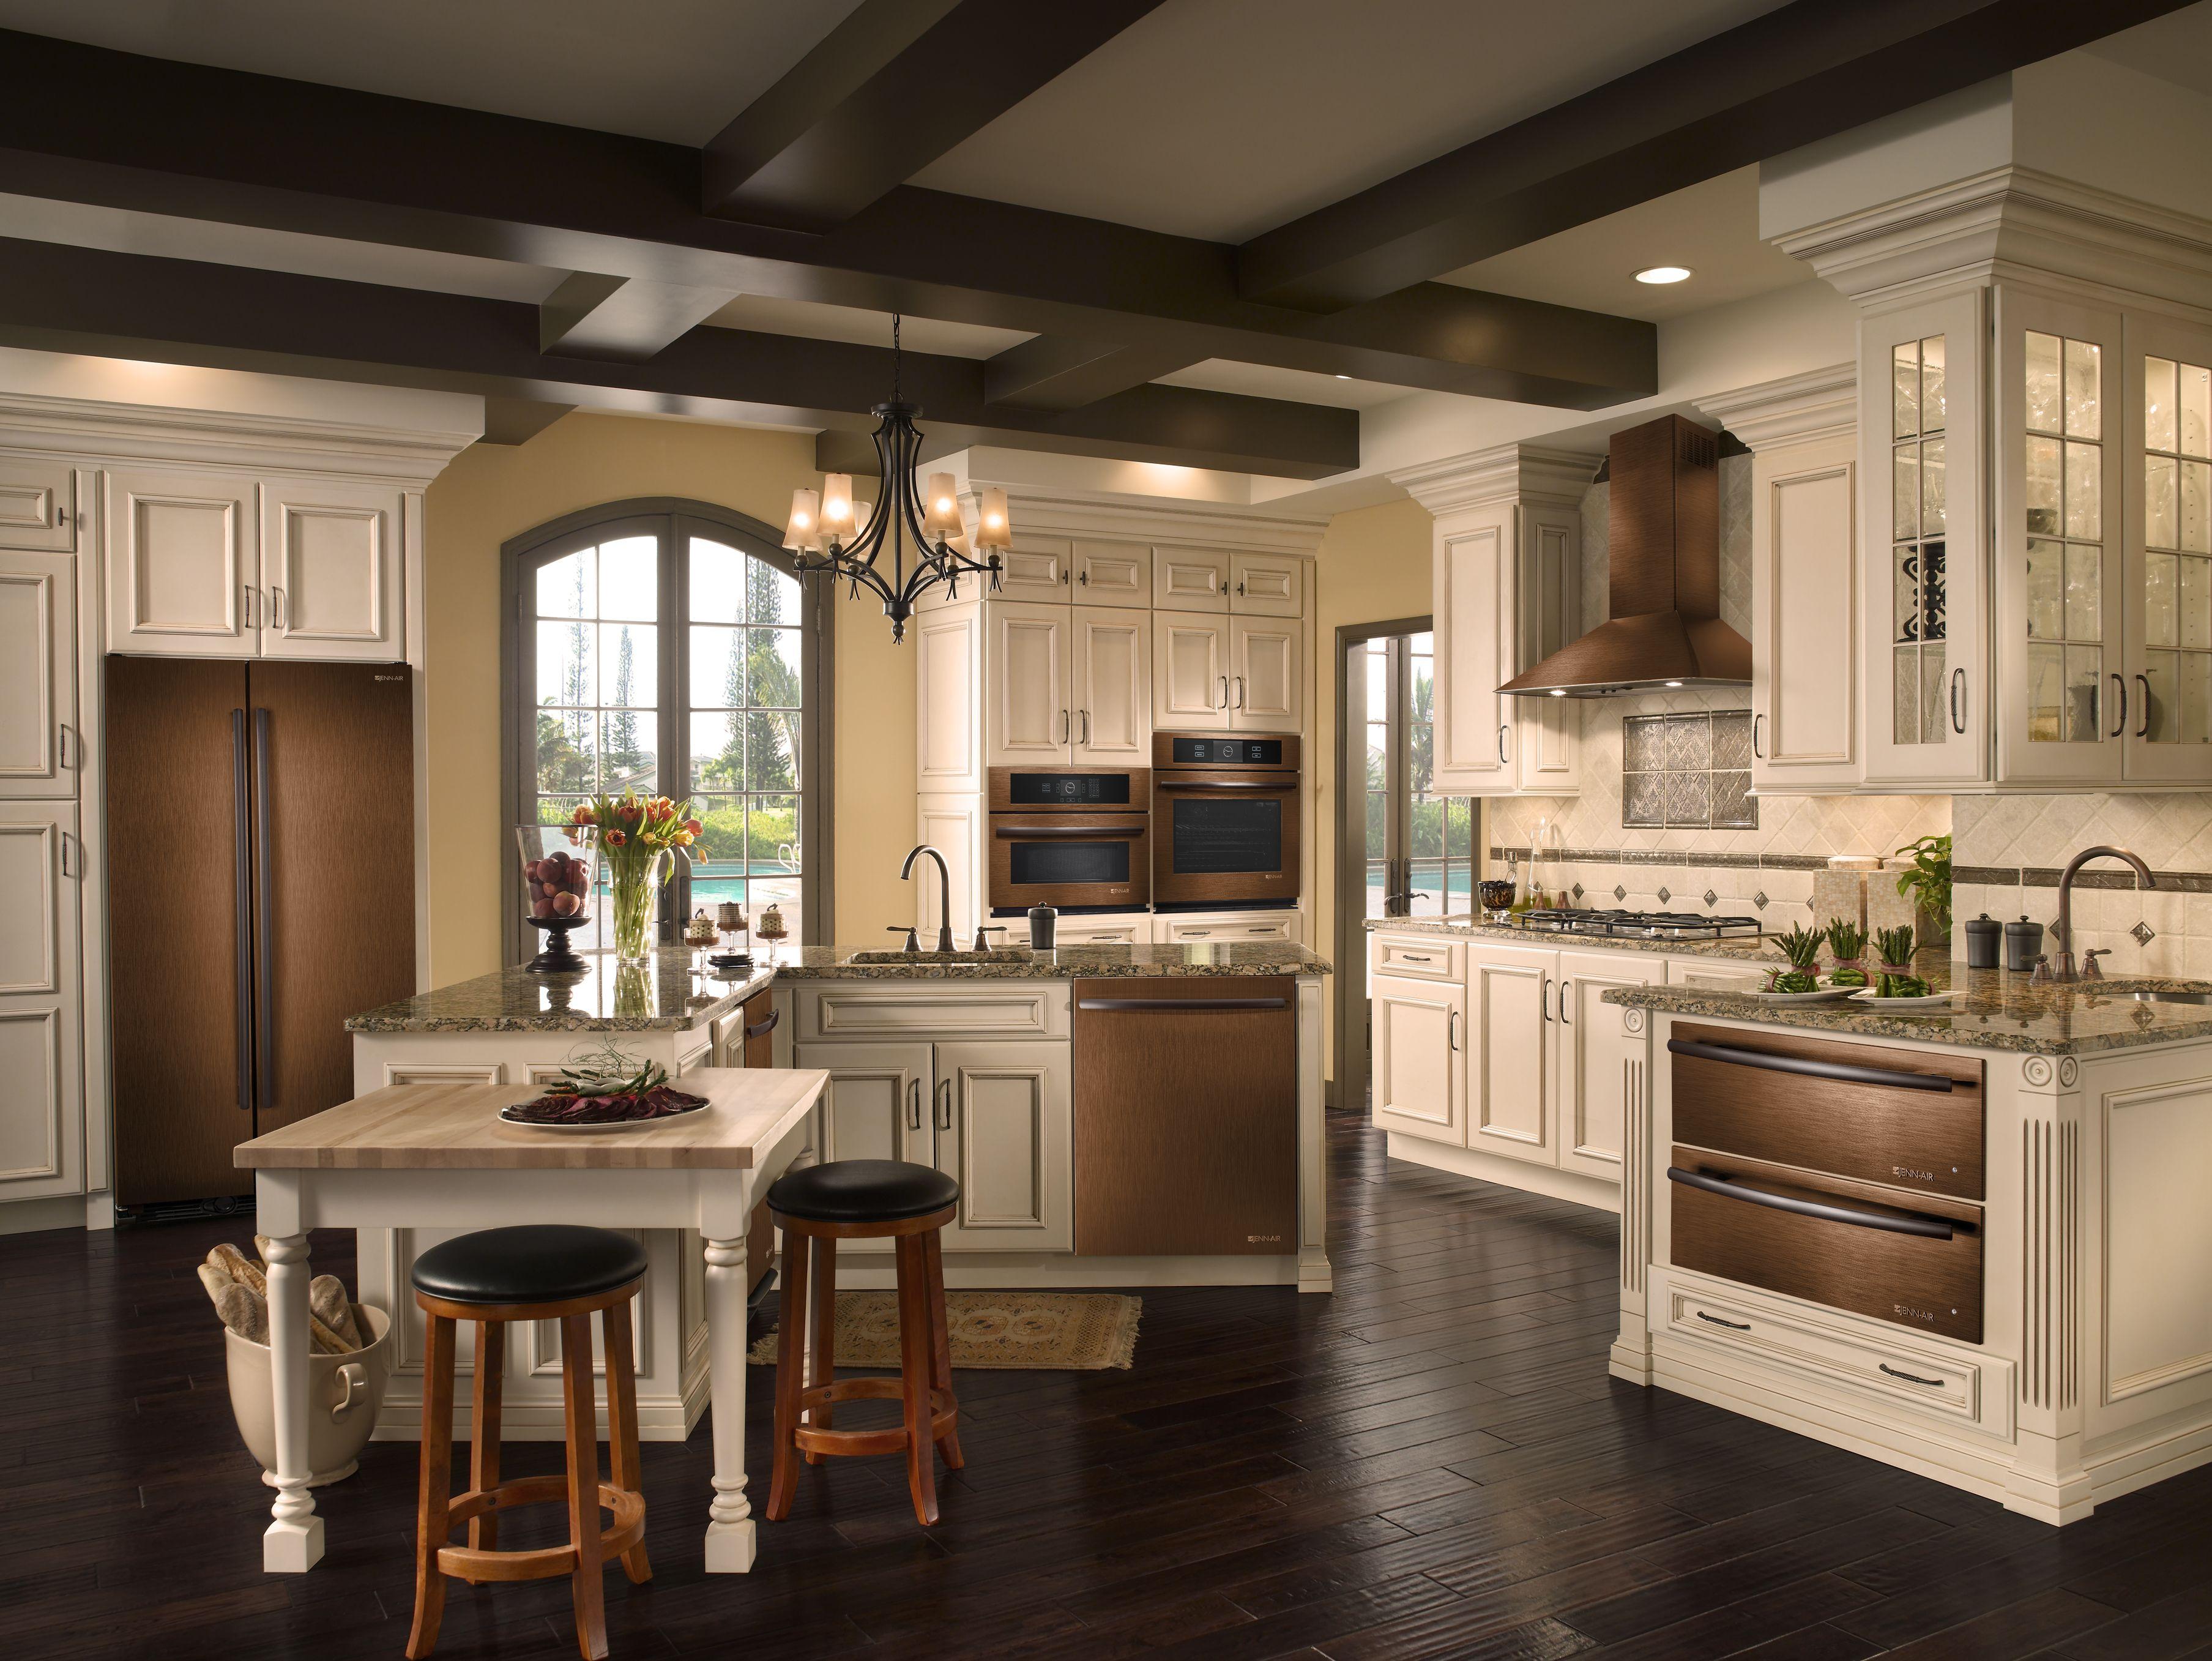 Best Kitchen Gallery: A Splash Of Unusual And Elegant Color In The Kitchen Jenn Air of Luxurious Kitchen Designs Refrigerator on rachelxblog.com